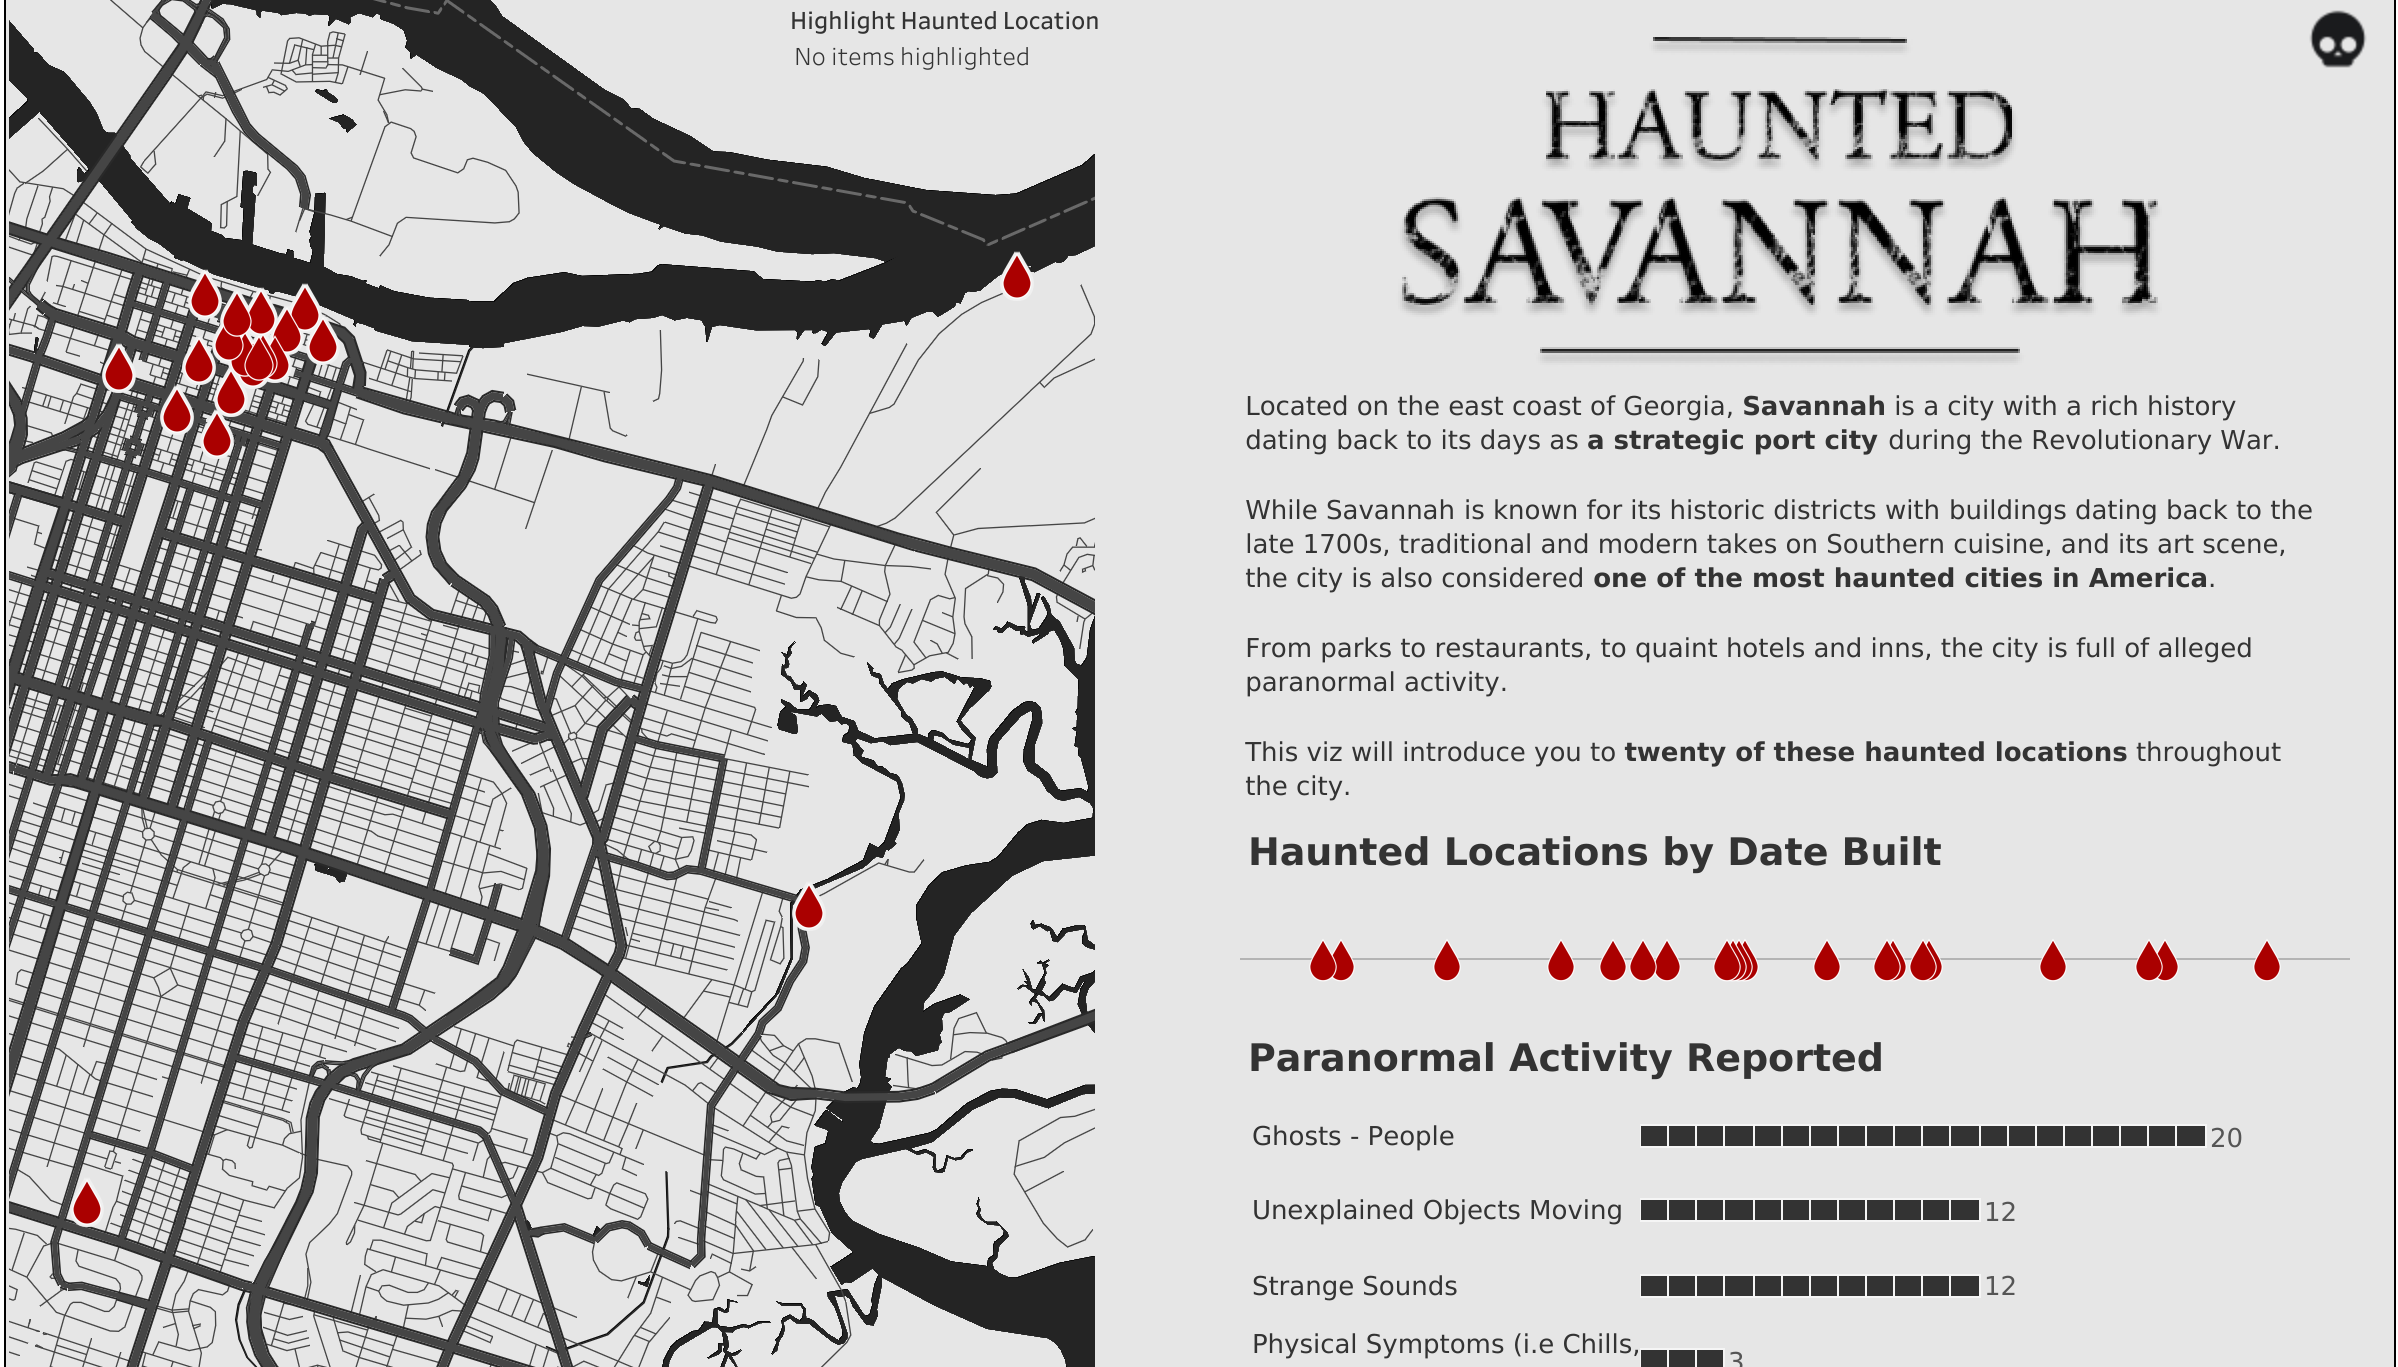 Viz of Haunted Savannah